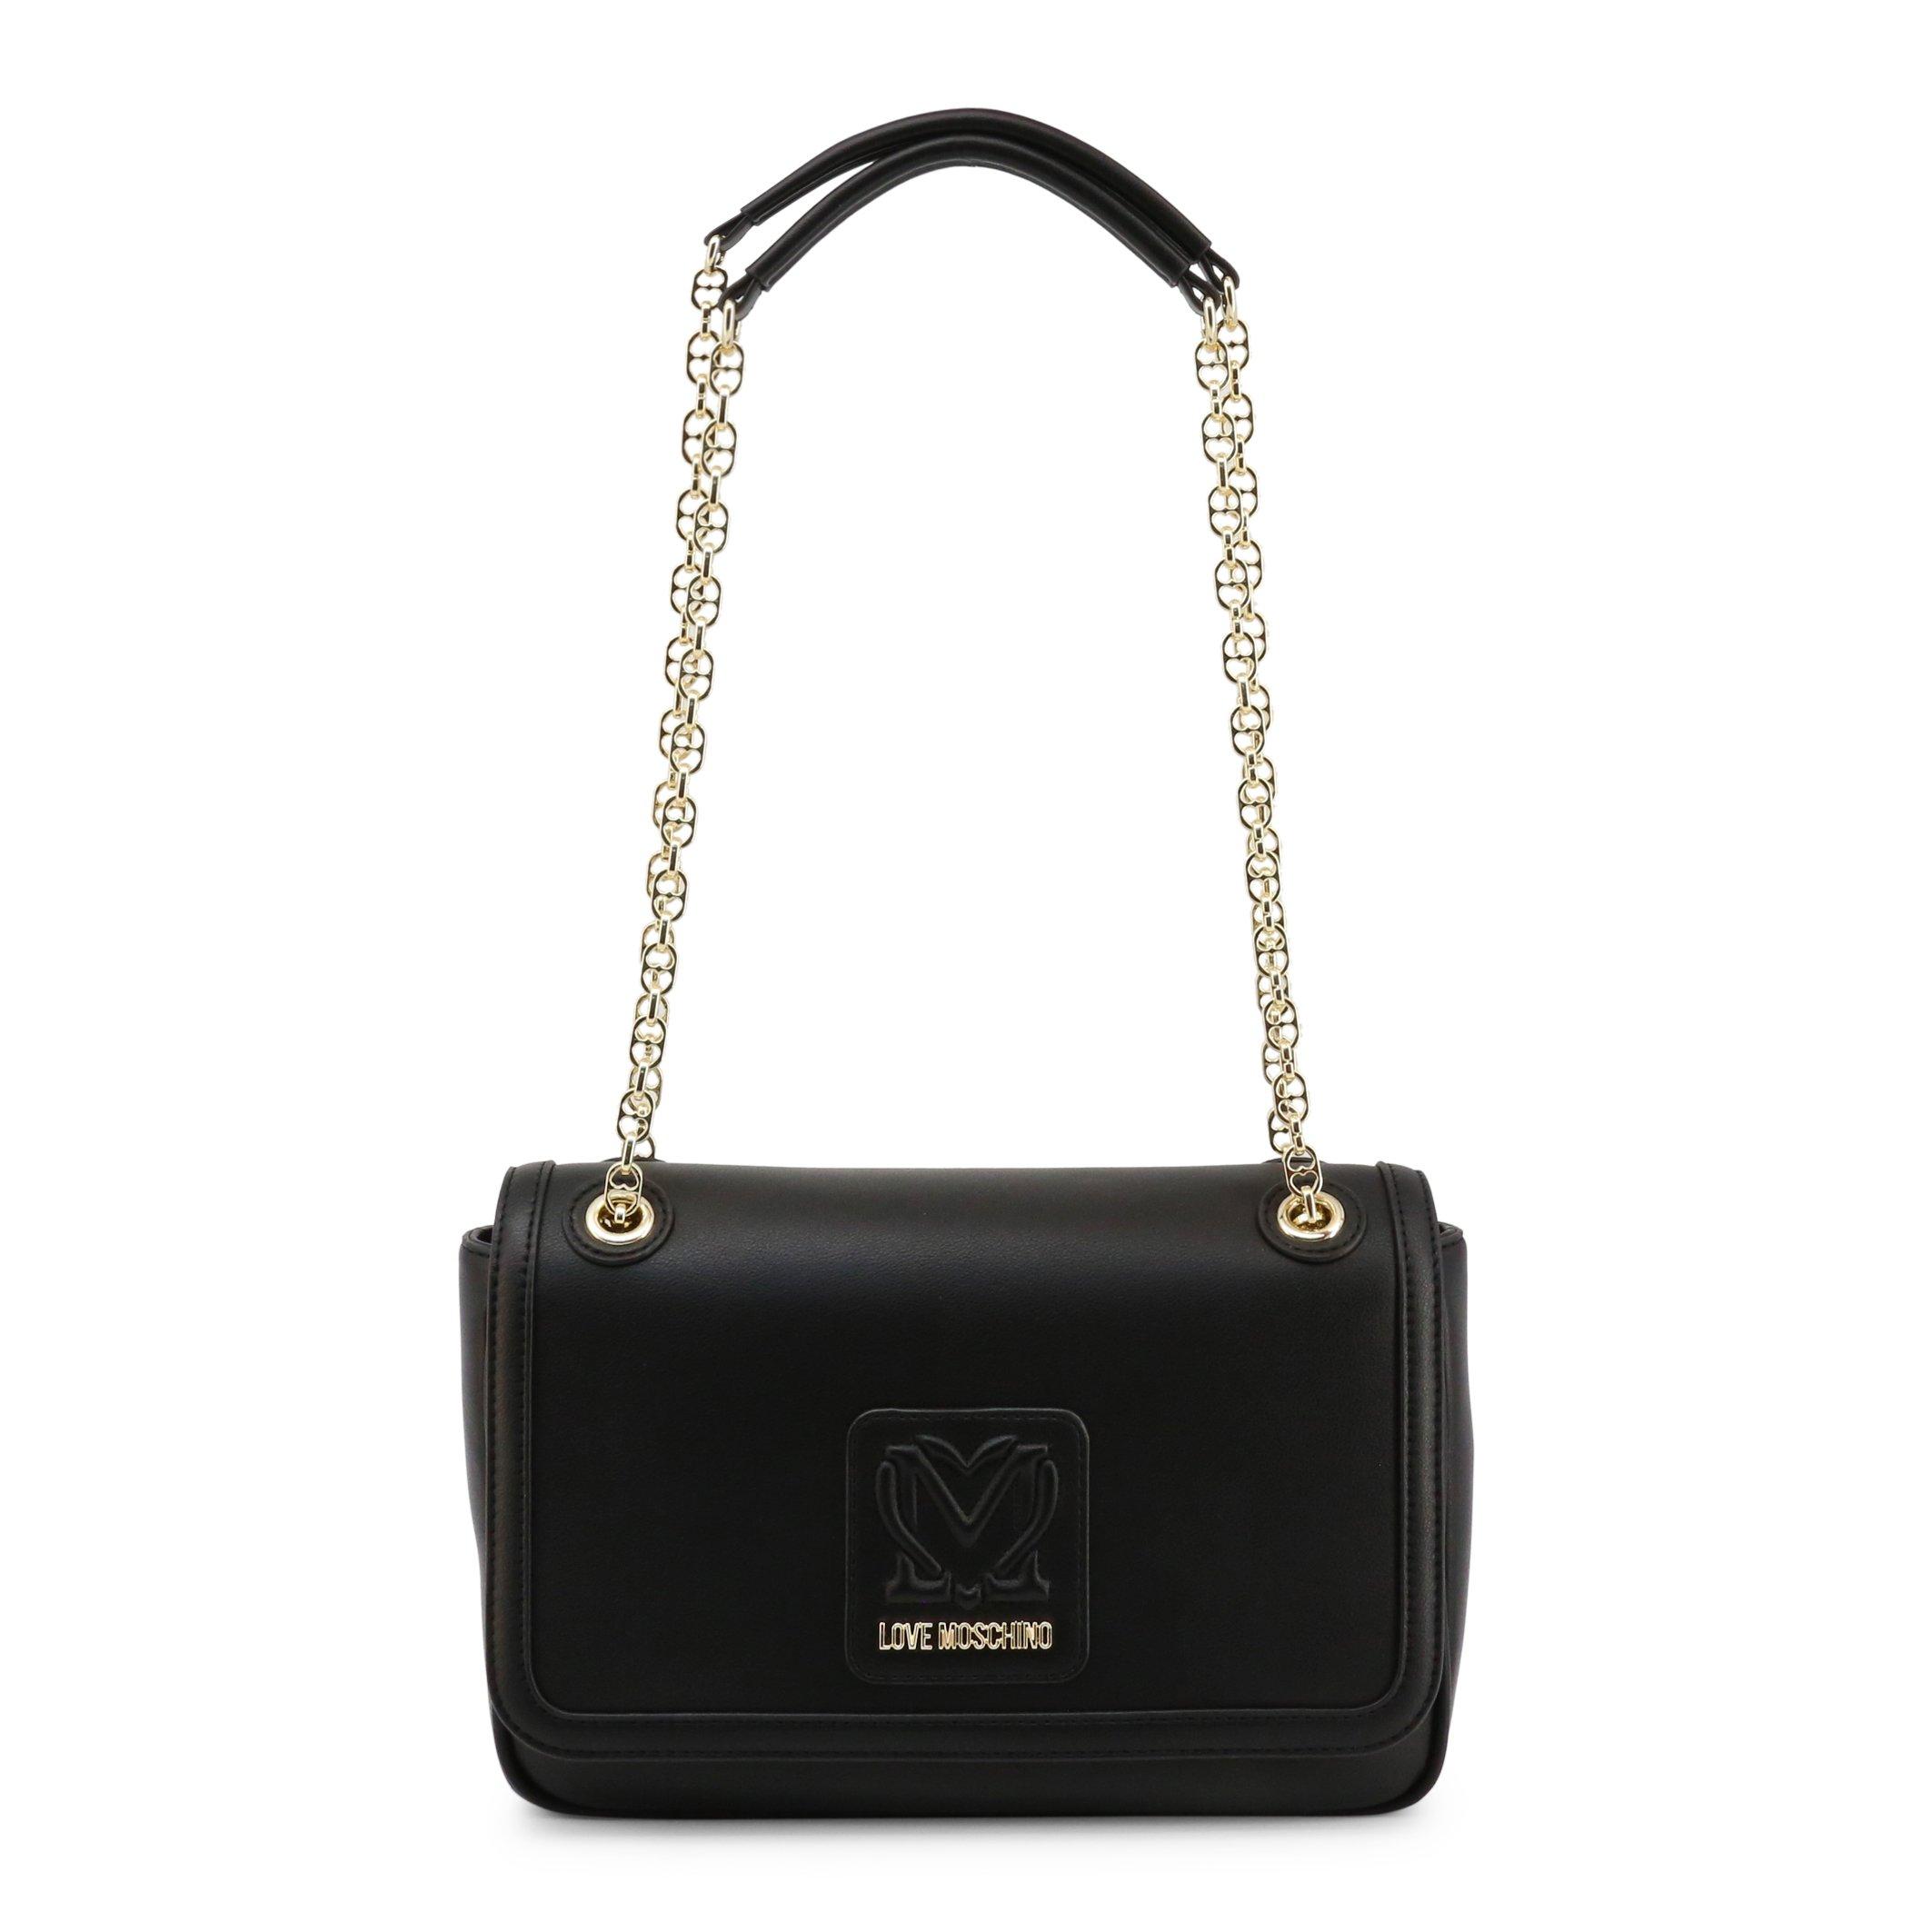 Love Moschino Women's Shoulder Bag Black JC4111PP1CLK1 - black-1 NOSIZE